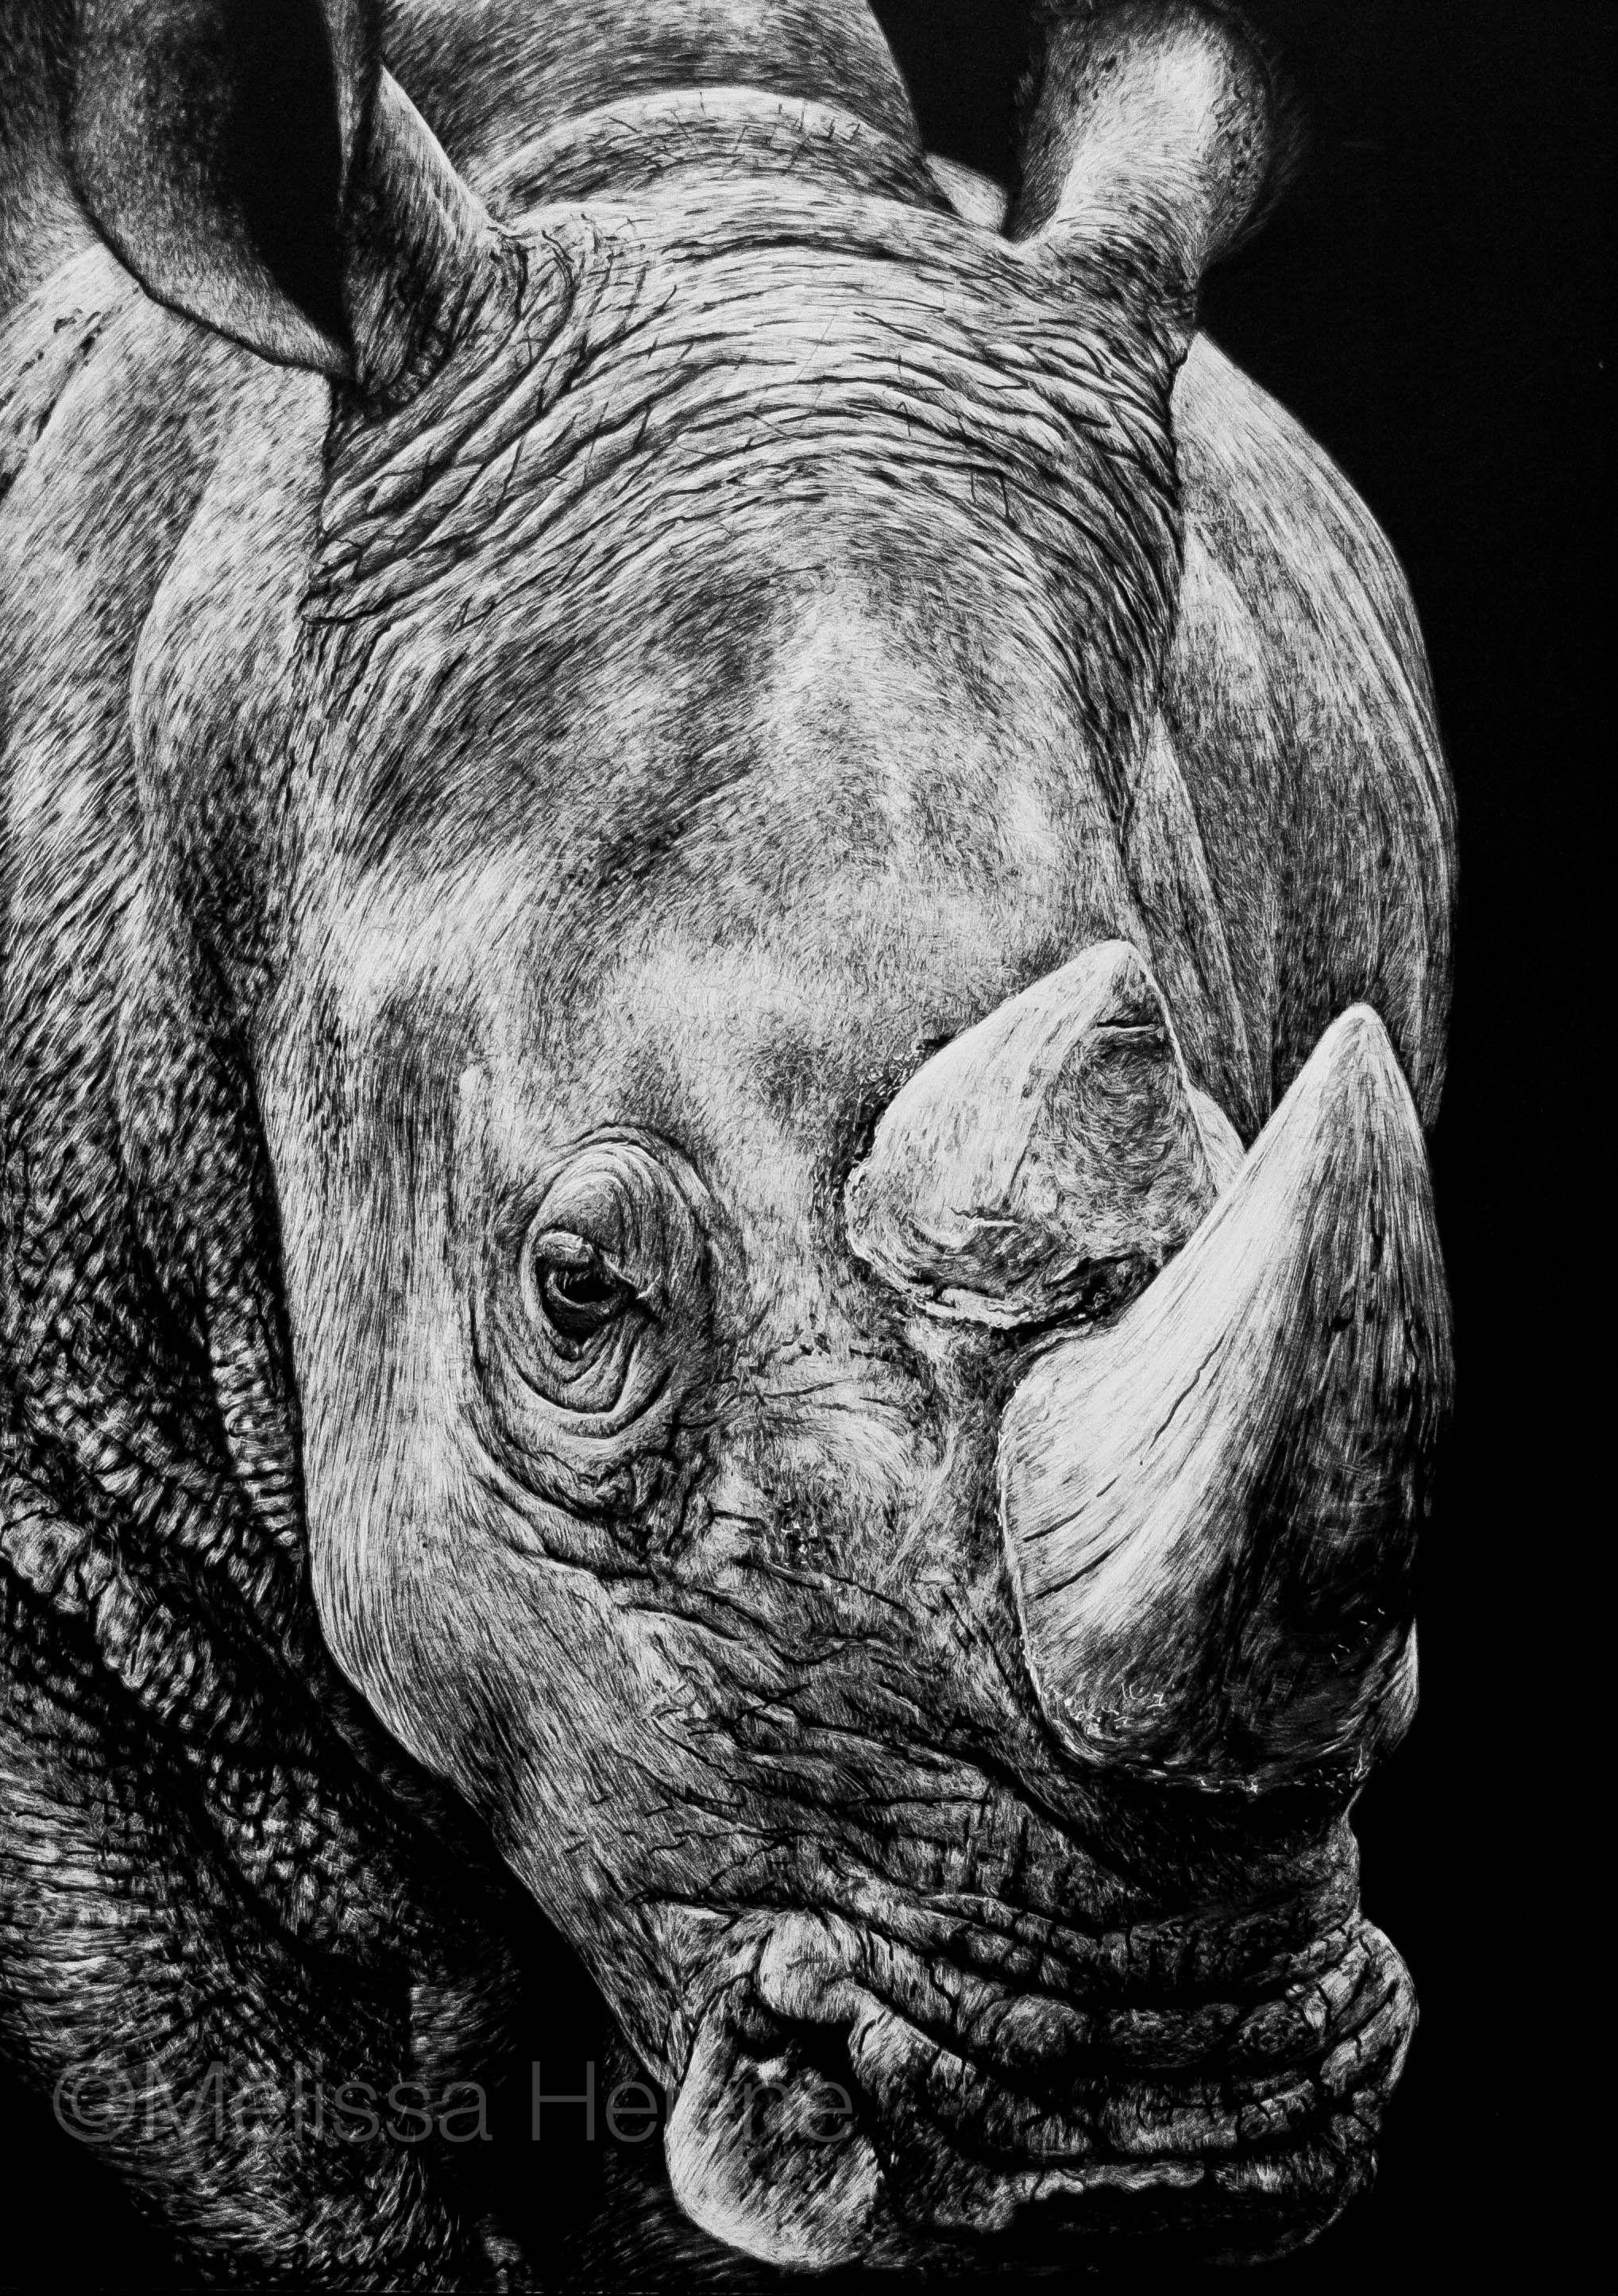 Rhino   5x7 scratchboard   Melissa Helene Fine Arts + Photography www.melissahelene.com #artwork #art #scratchboard #scratchart #wildlife #animalart #rhino #endangeredspecies #melissahelenefinearts #blackandwhite #conservation #conservationart #conservationartist